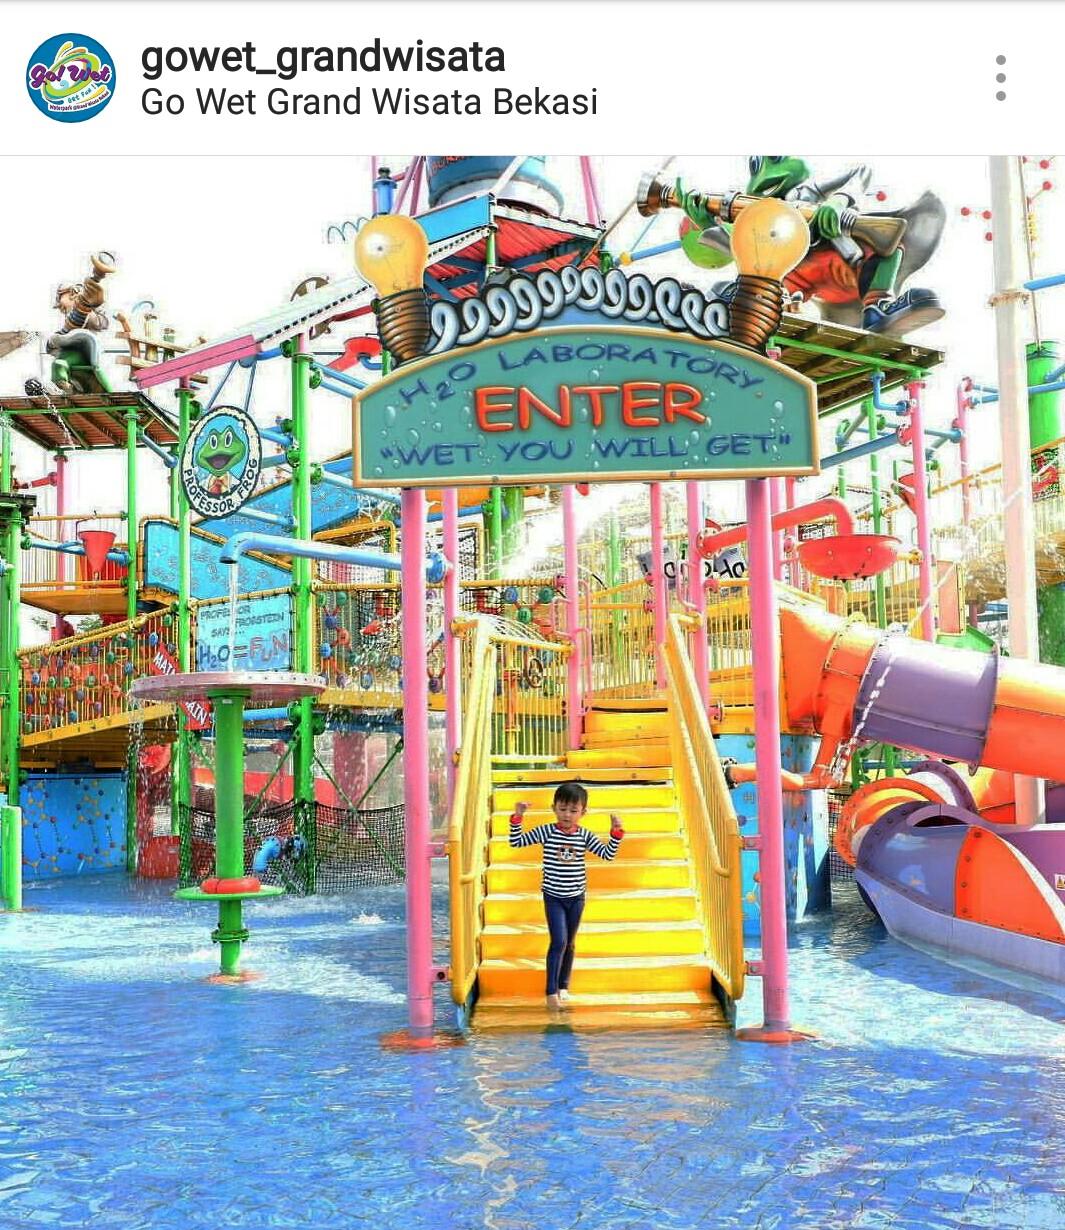 Go Wet Water Adventure Bekasi Kids Holiday Spots Liburan Anak Tiket Masuk Waterpark Grand Wisata Liburananak Gowetbekasi